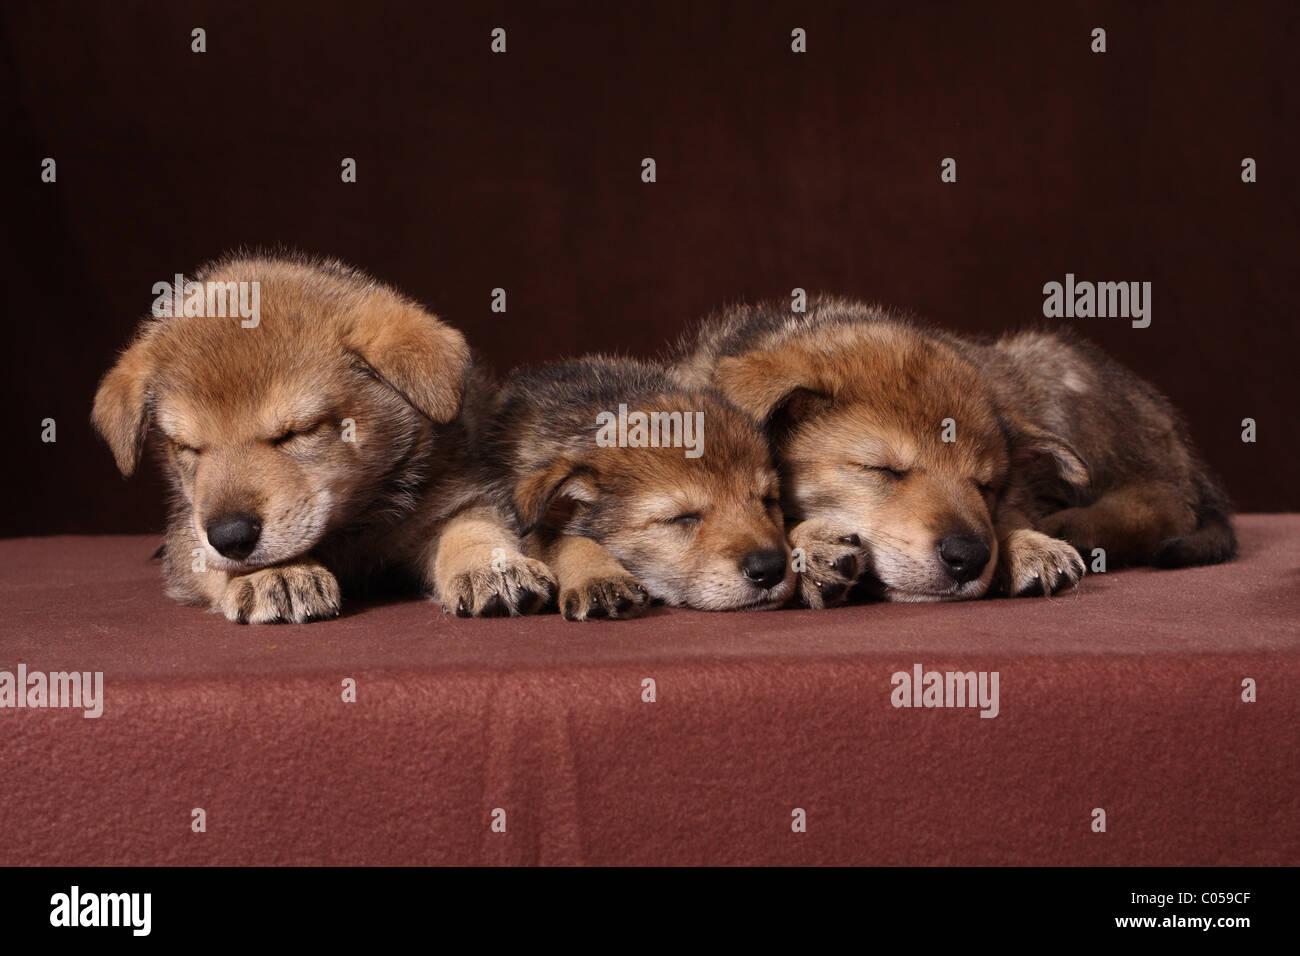 sleeping Saarloos Wolfdog puppies - Stock Image